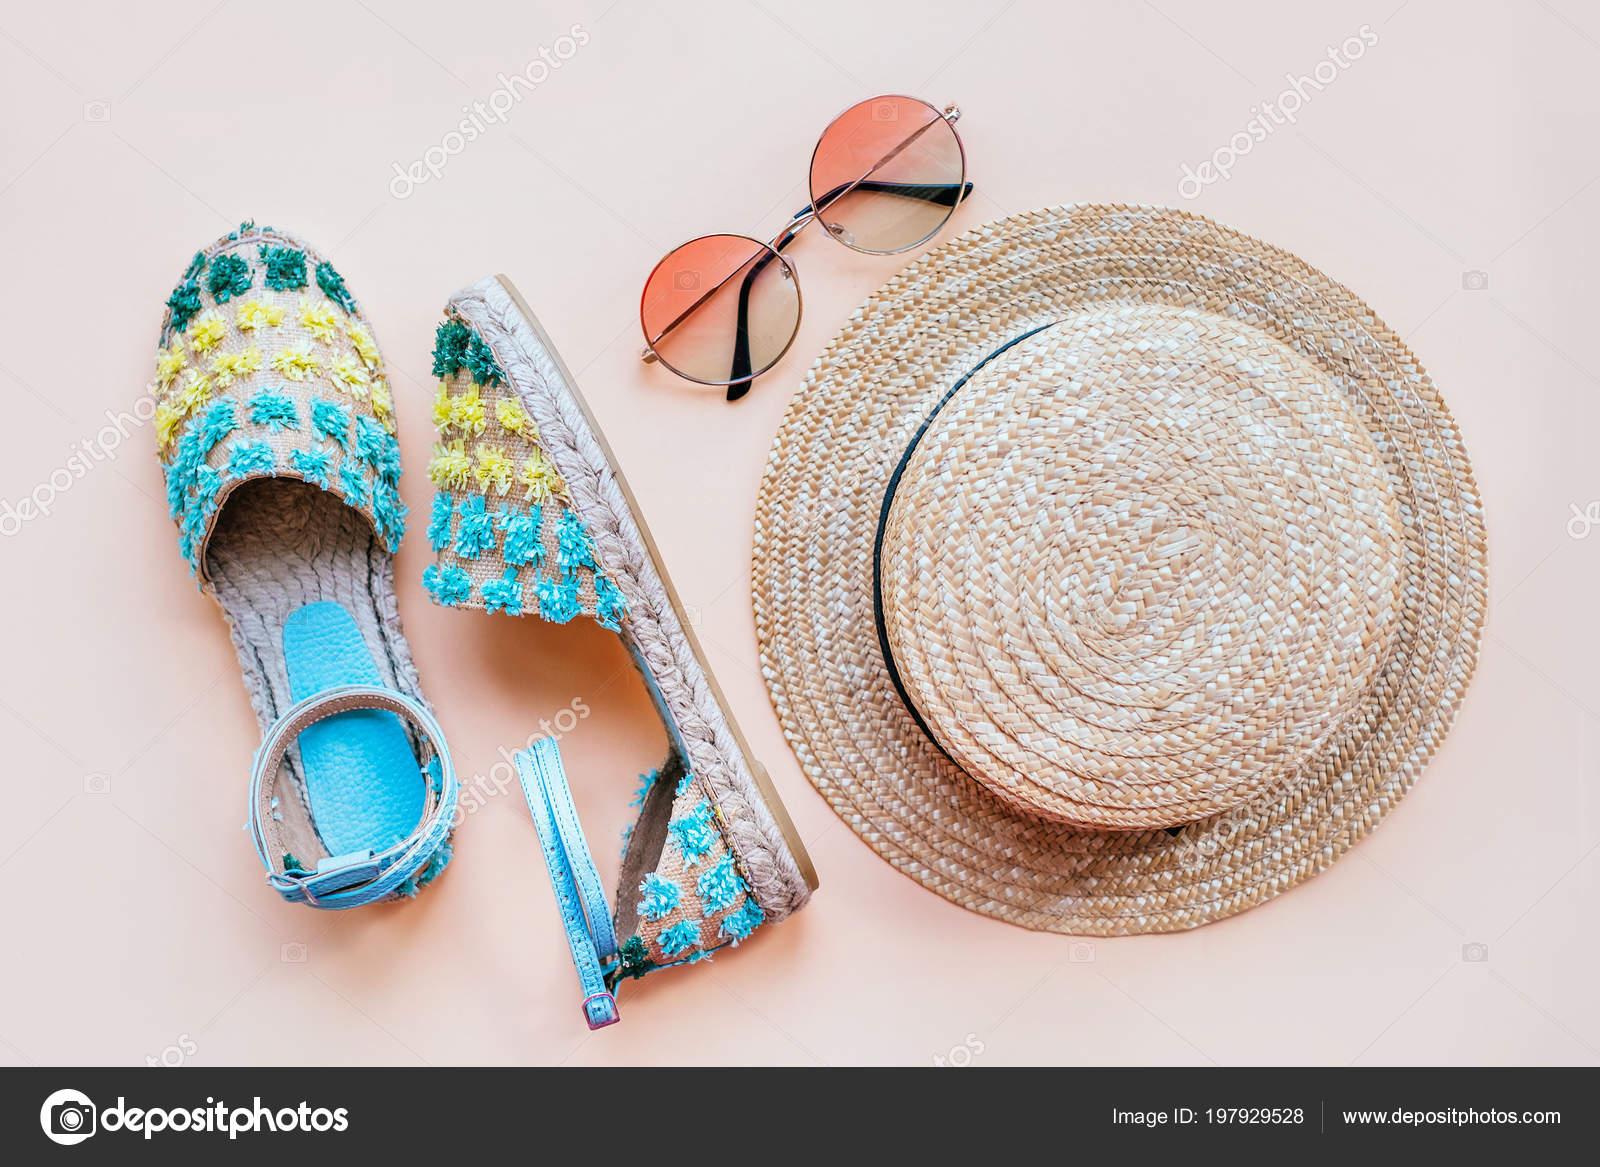 cc22c3838e Καλοκαίρι Μόδα Flatlay Εσπαντρίγιες Πέδιλα Ντεγκραντέ Στρογγυλά Γυαλιά  Ηλίου Και– εικόνα αρχείου